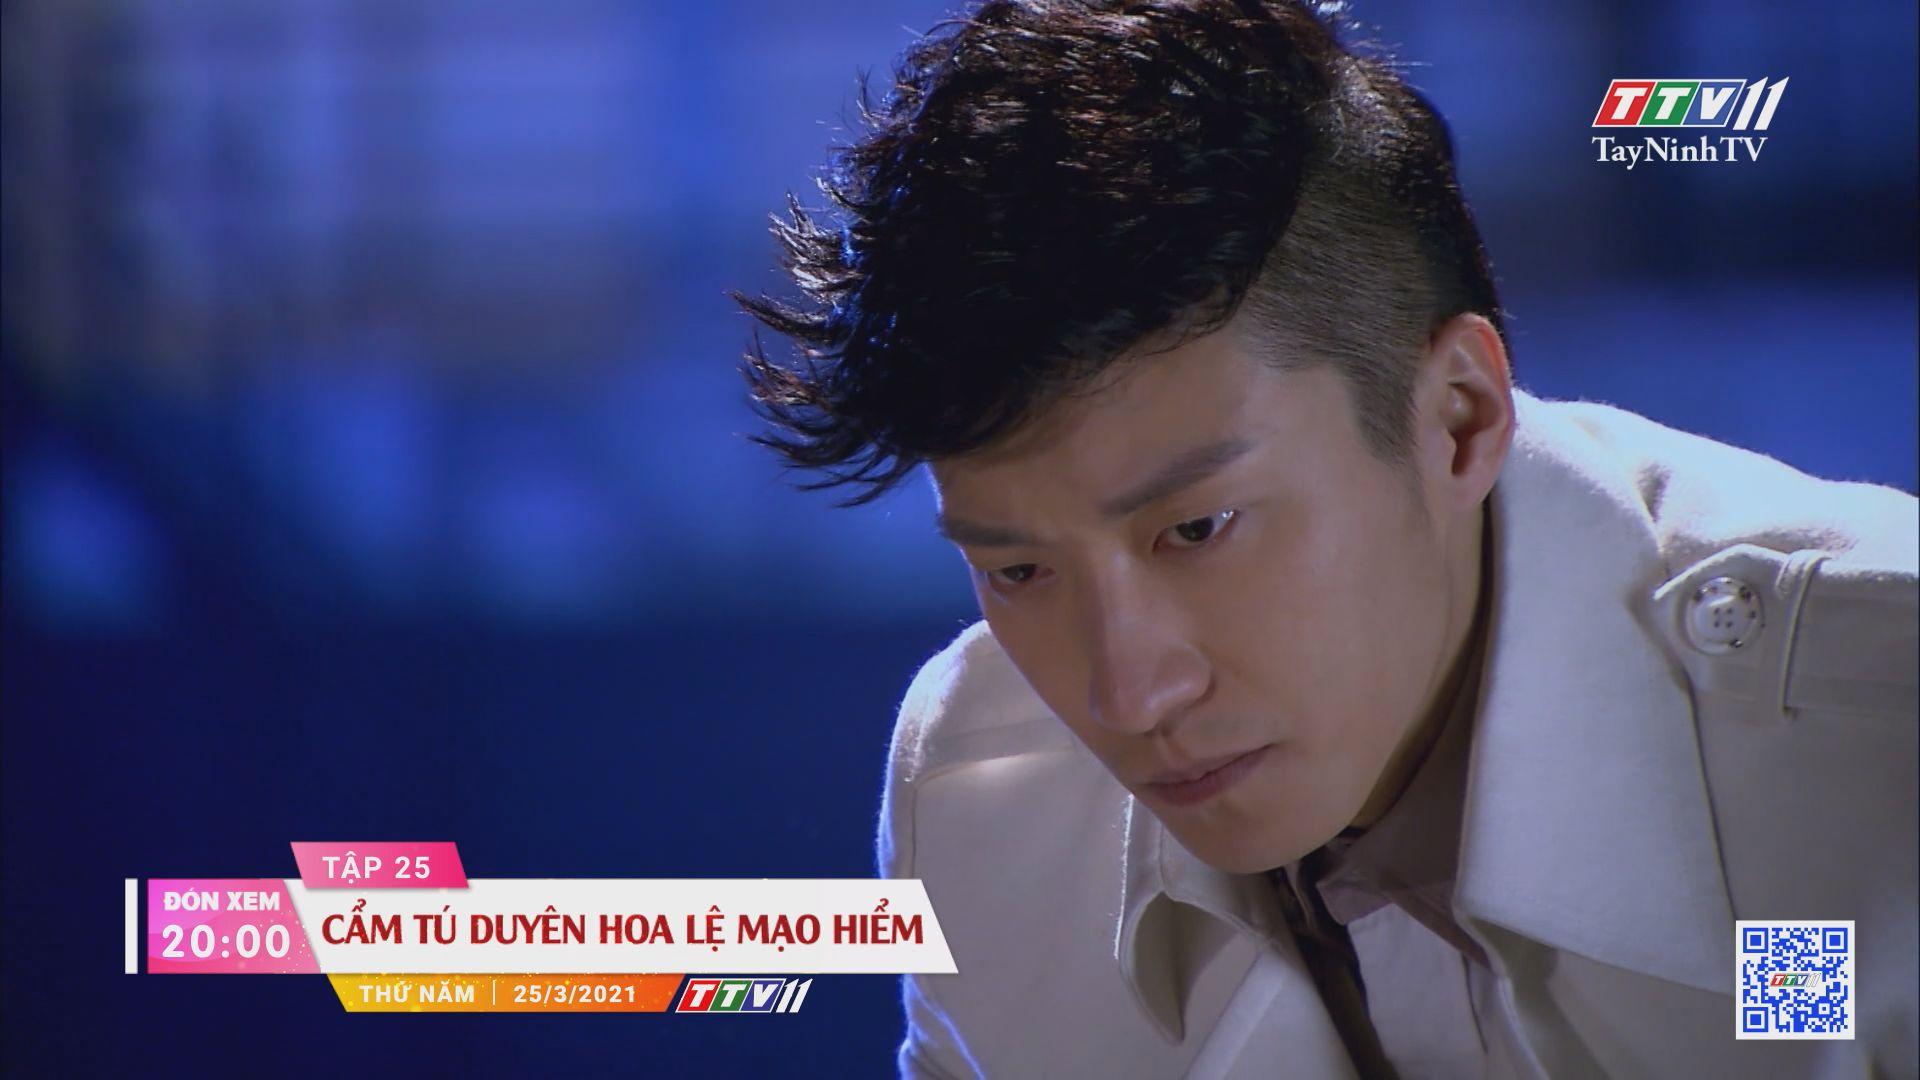 Cẩm Tú duyên hoa lệ mạo hiểm-Trailer tập 25 | PHIM CẨM TÚ DUYÊN HOA LỆ MẠO HIỂM | TayNinhTVE